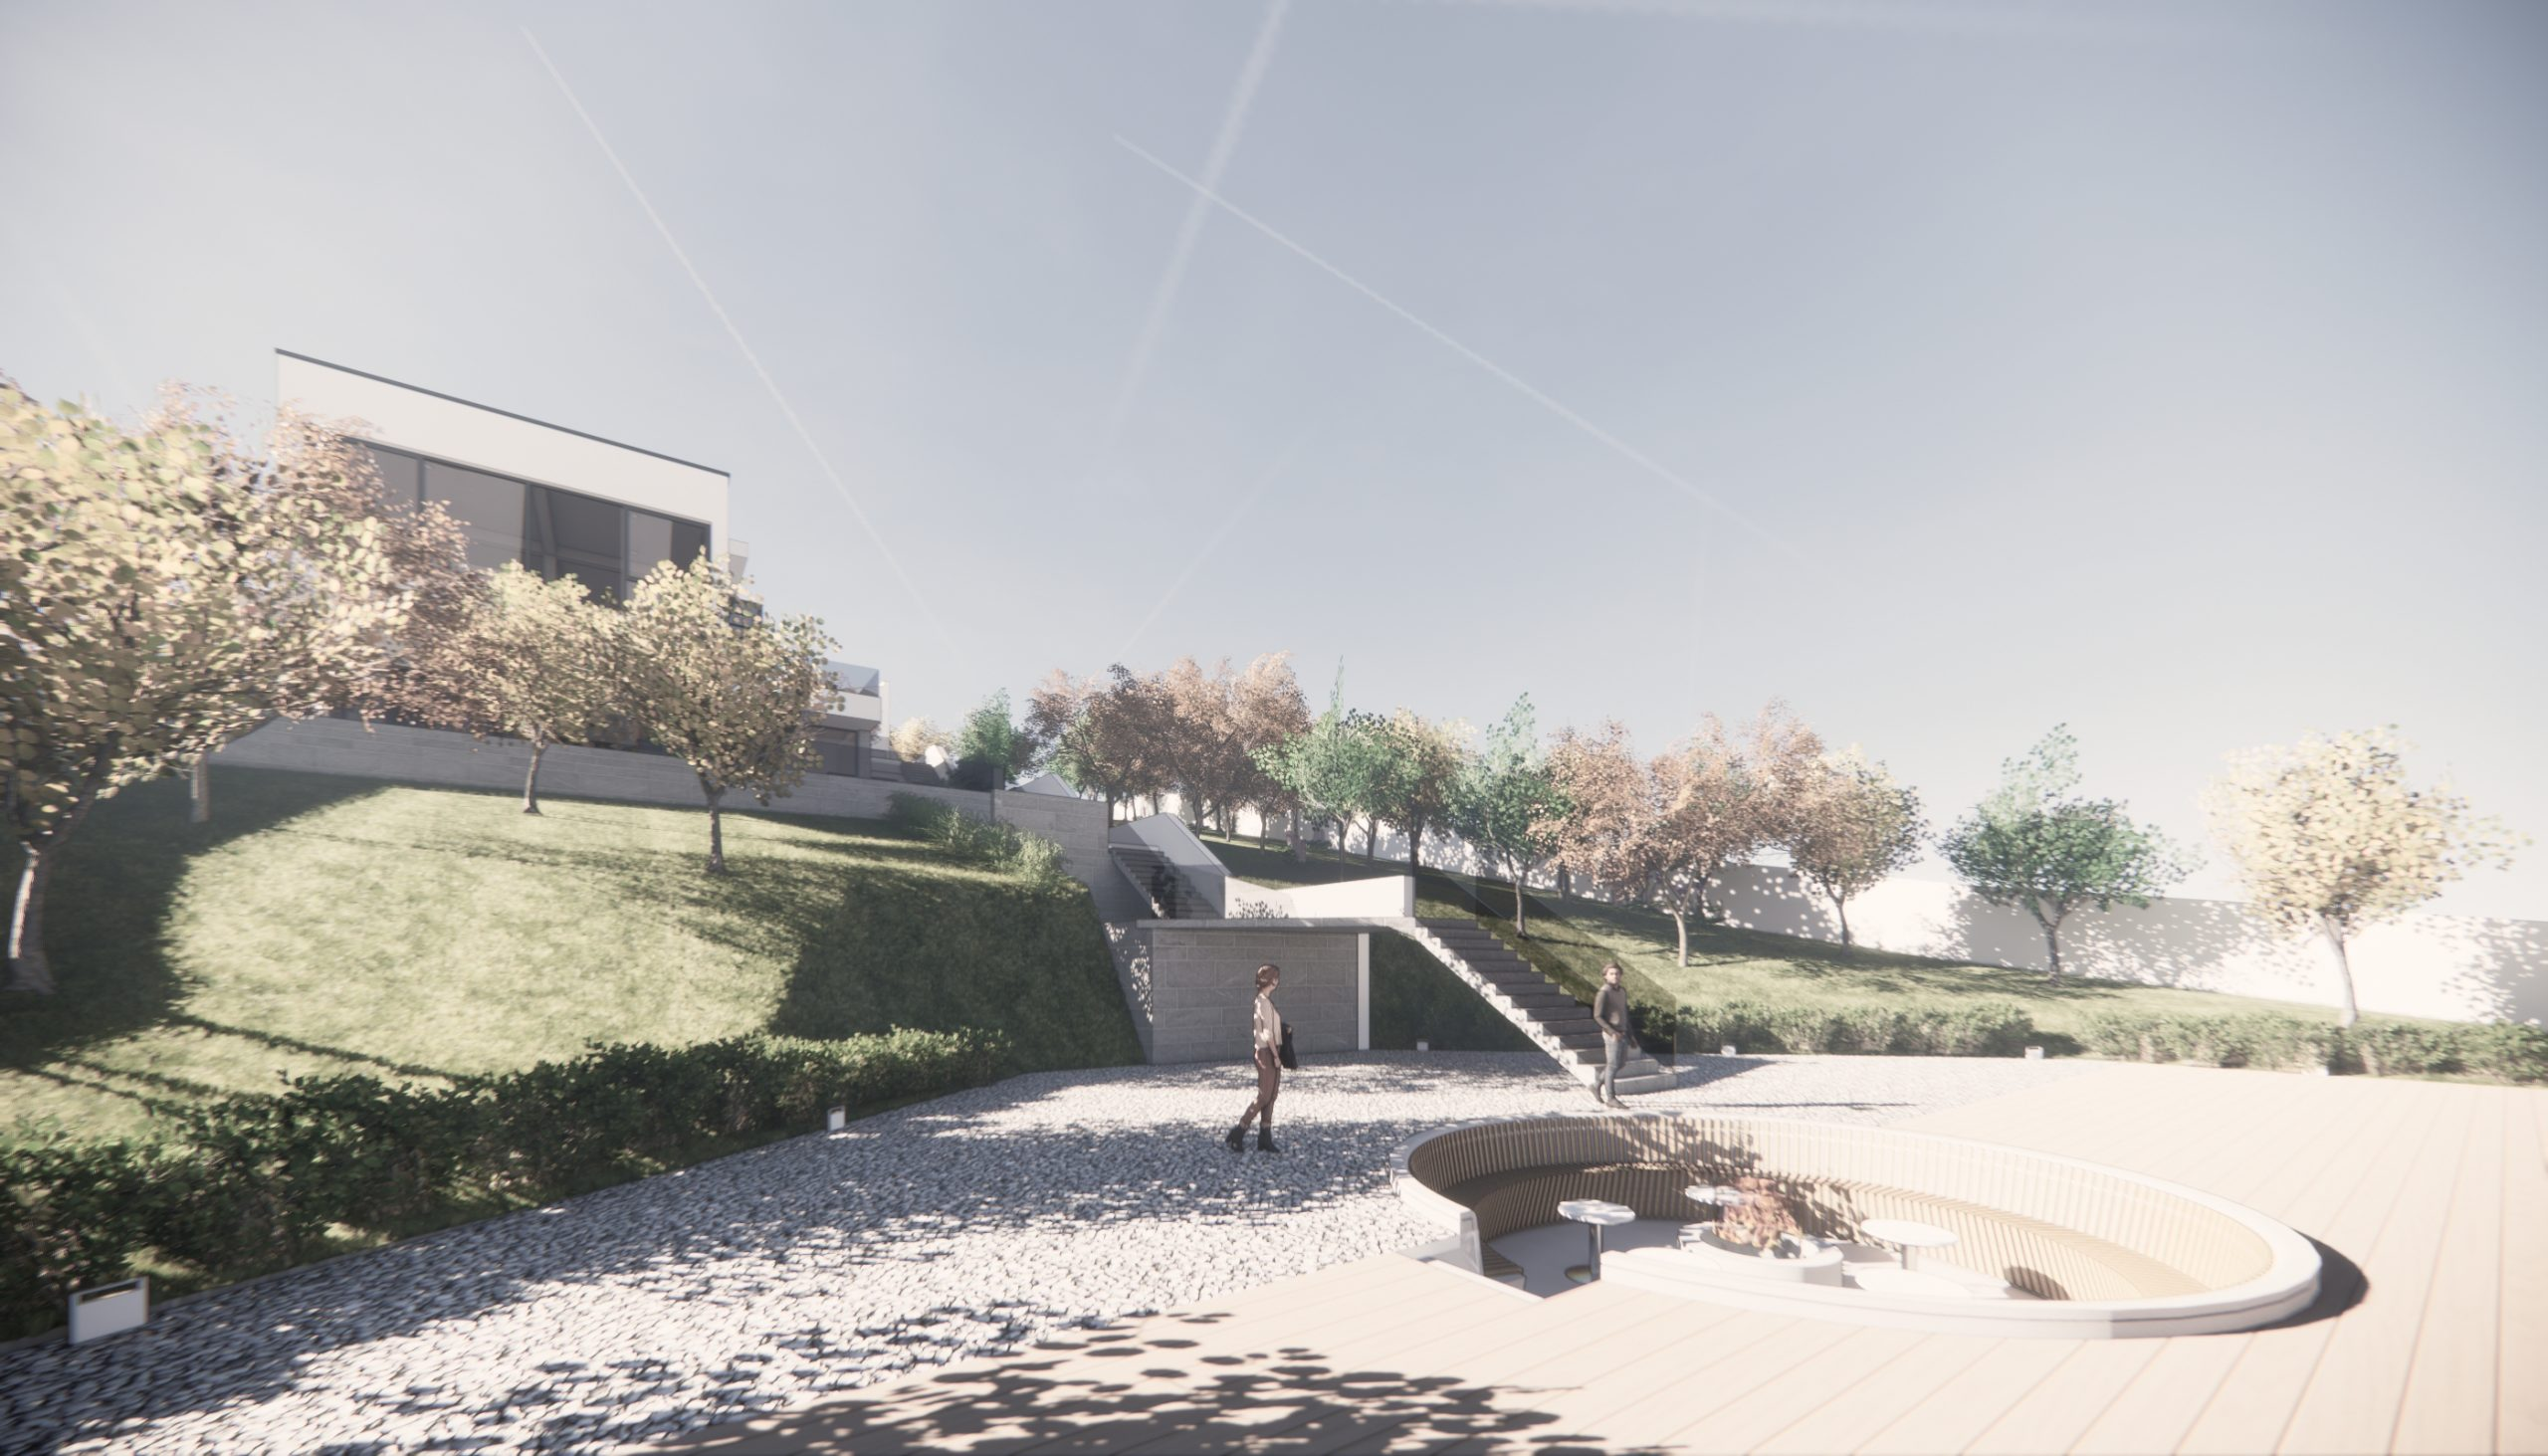 https://nbc-arhitect.ro/wp-content/uploads/2020/11/NBC-Arhitect-_-residential-_-2x-Snagov-_-Snagov-Romania_10-scaled.jpg